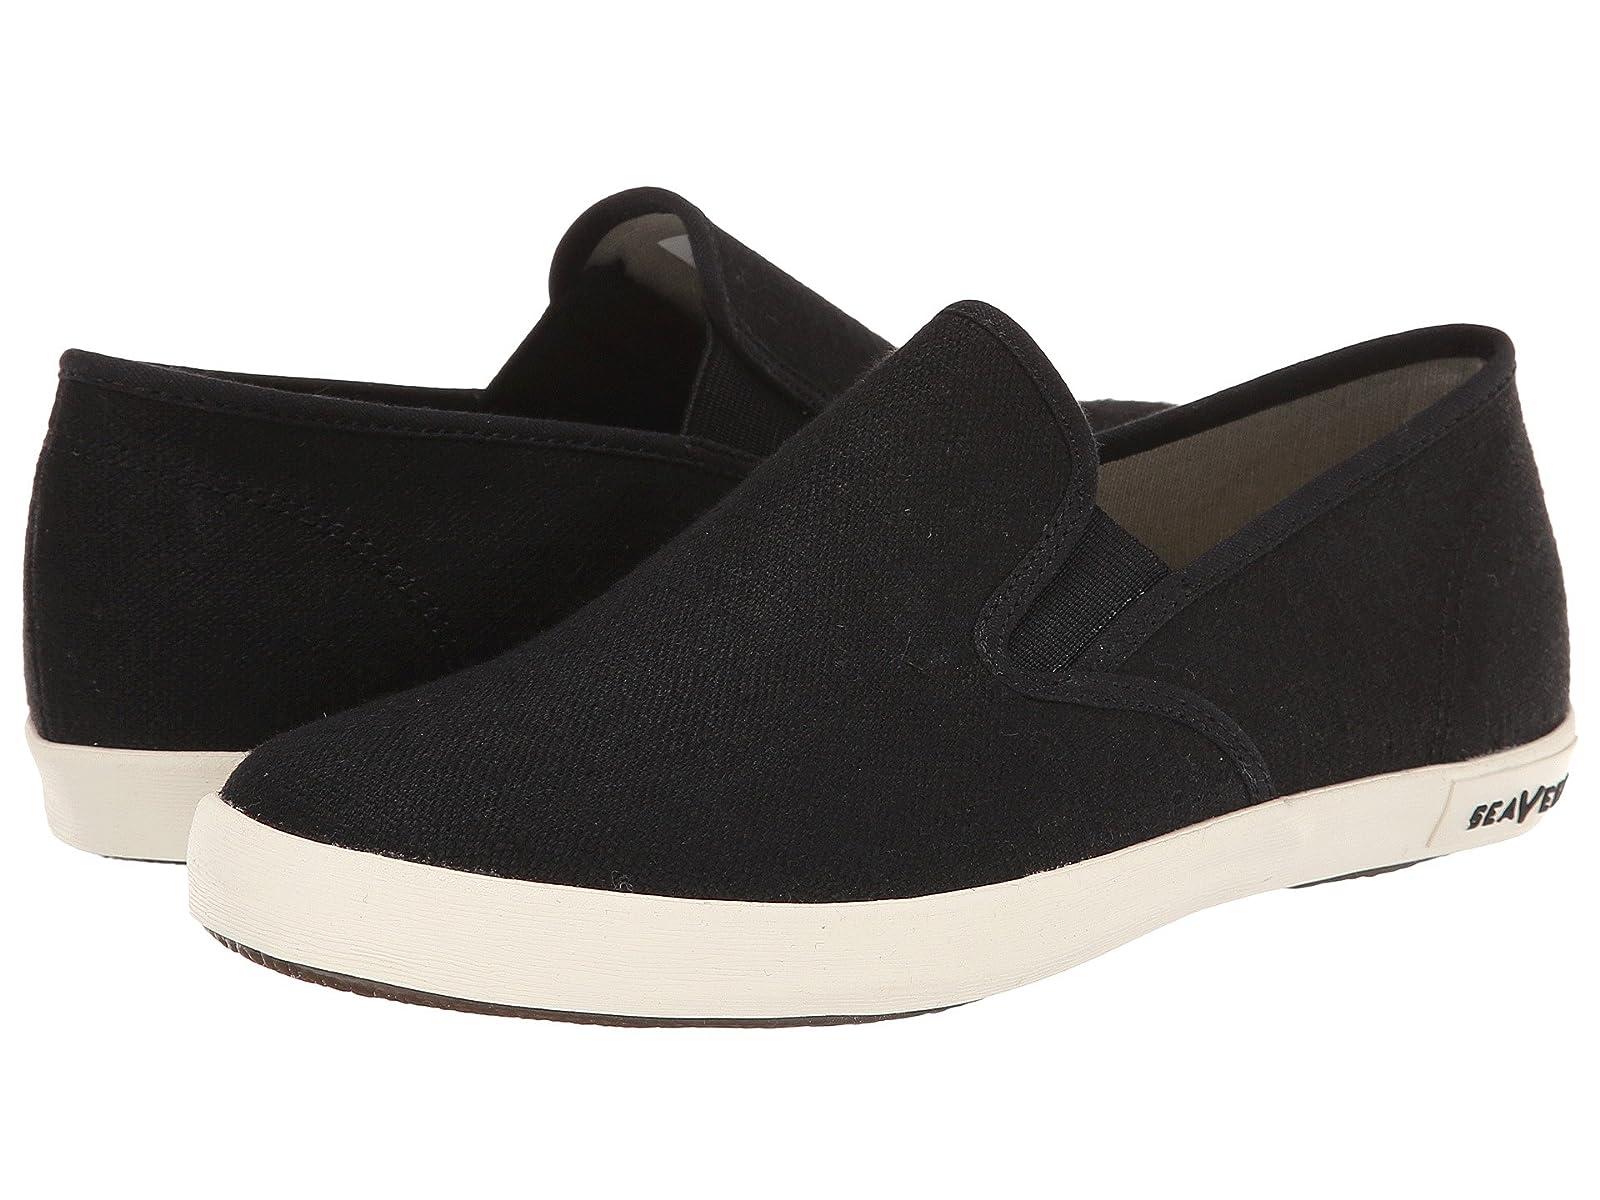 SeaVees 02/64 Baja Slip-on StandardAtmospheric grades have affordable shoes